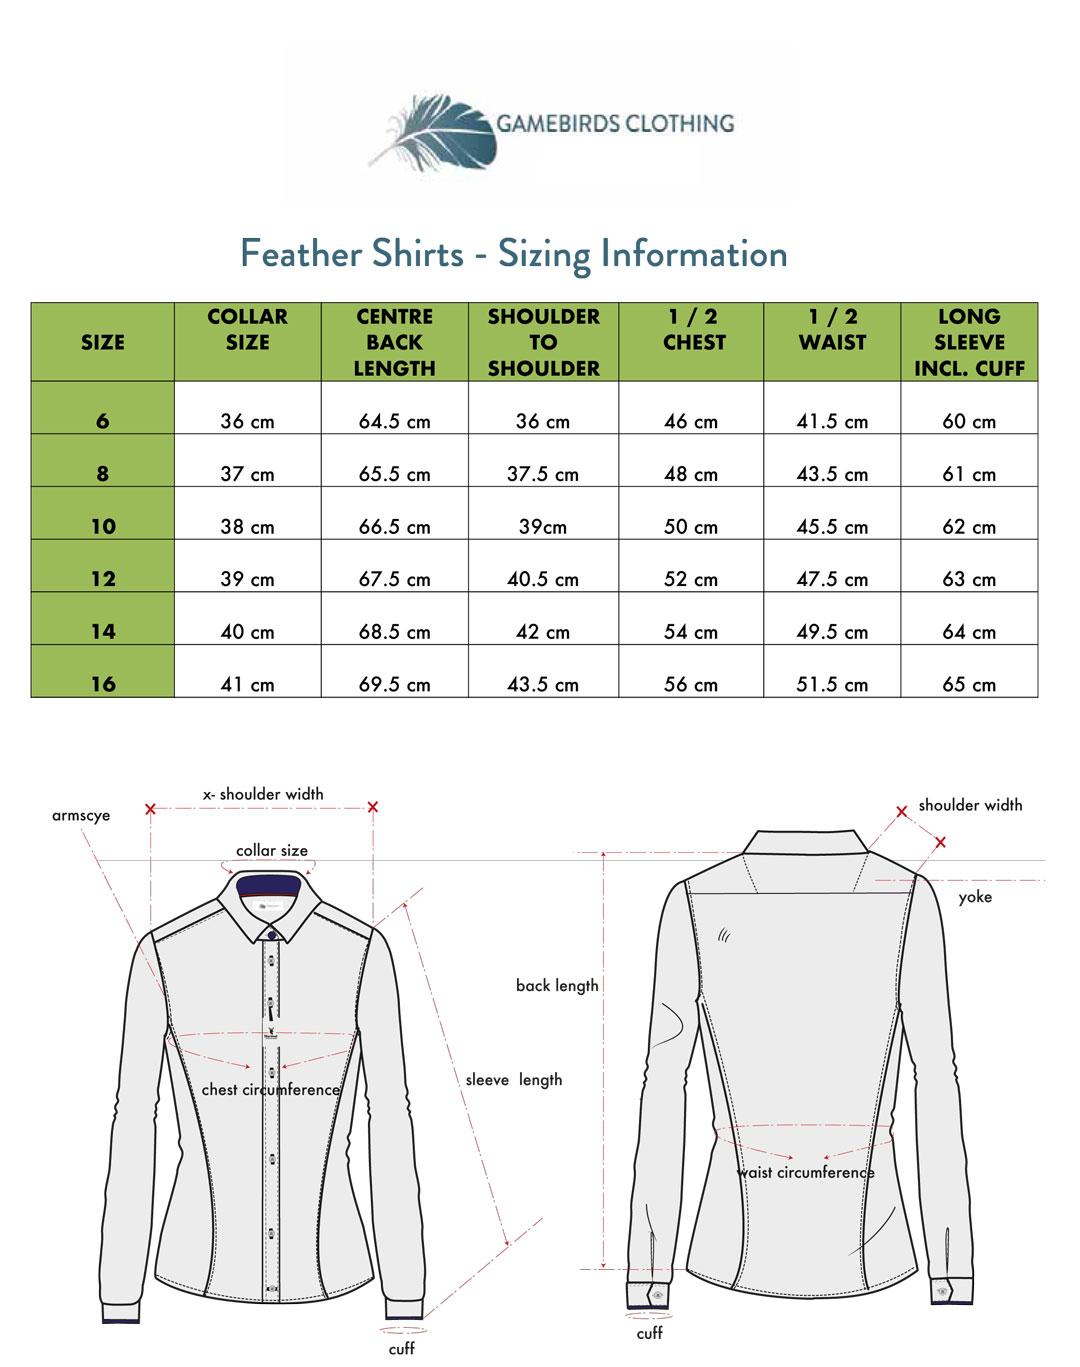 Feather Print Shirt Sizing